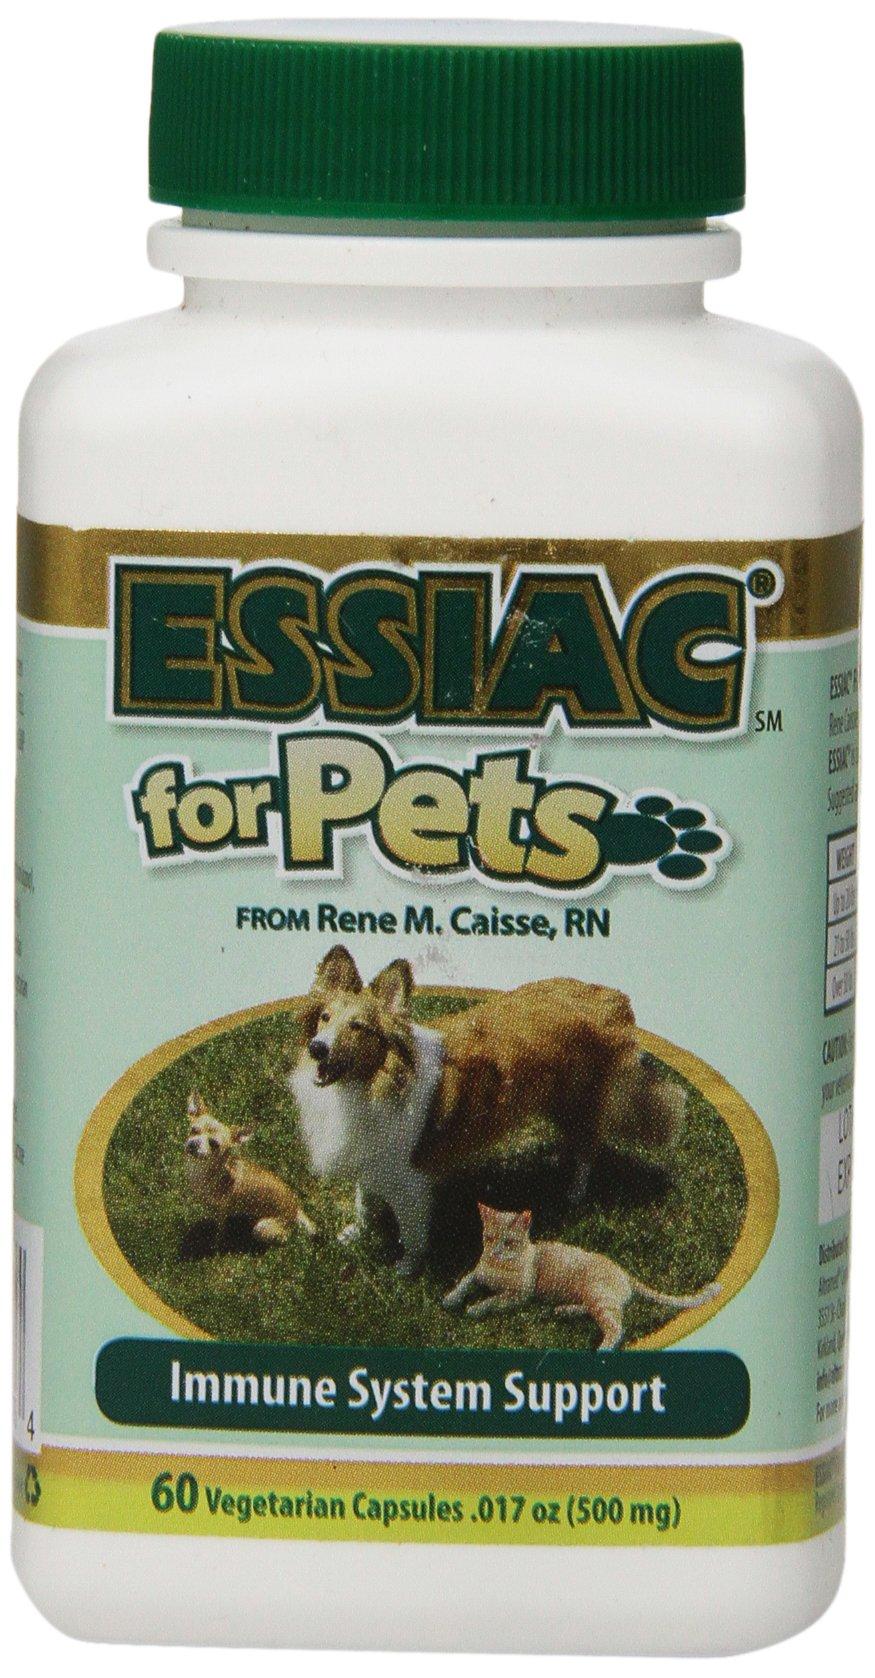 Essiac International Herbal Supplement for Pets, 60 Capsules